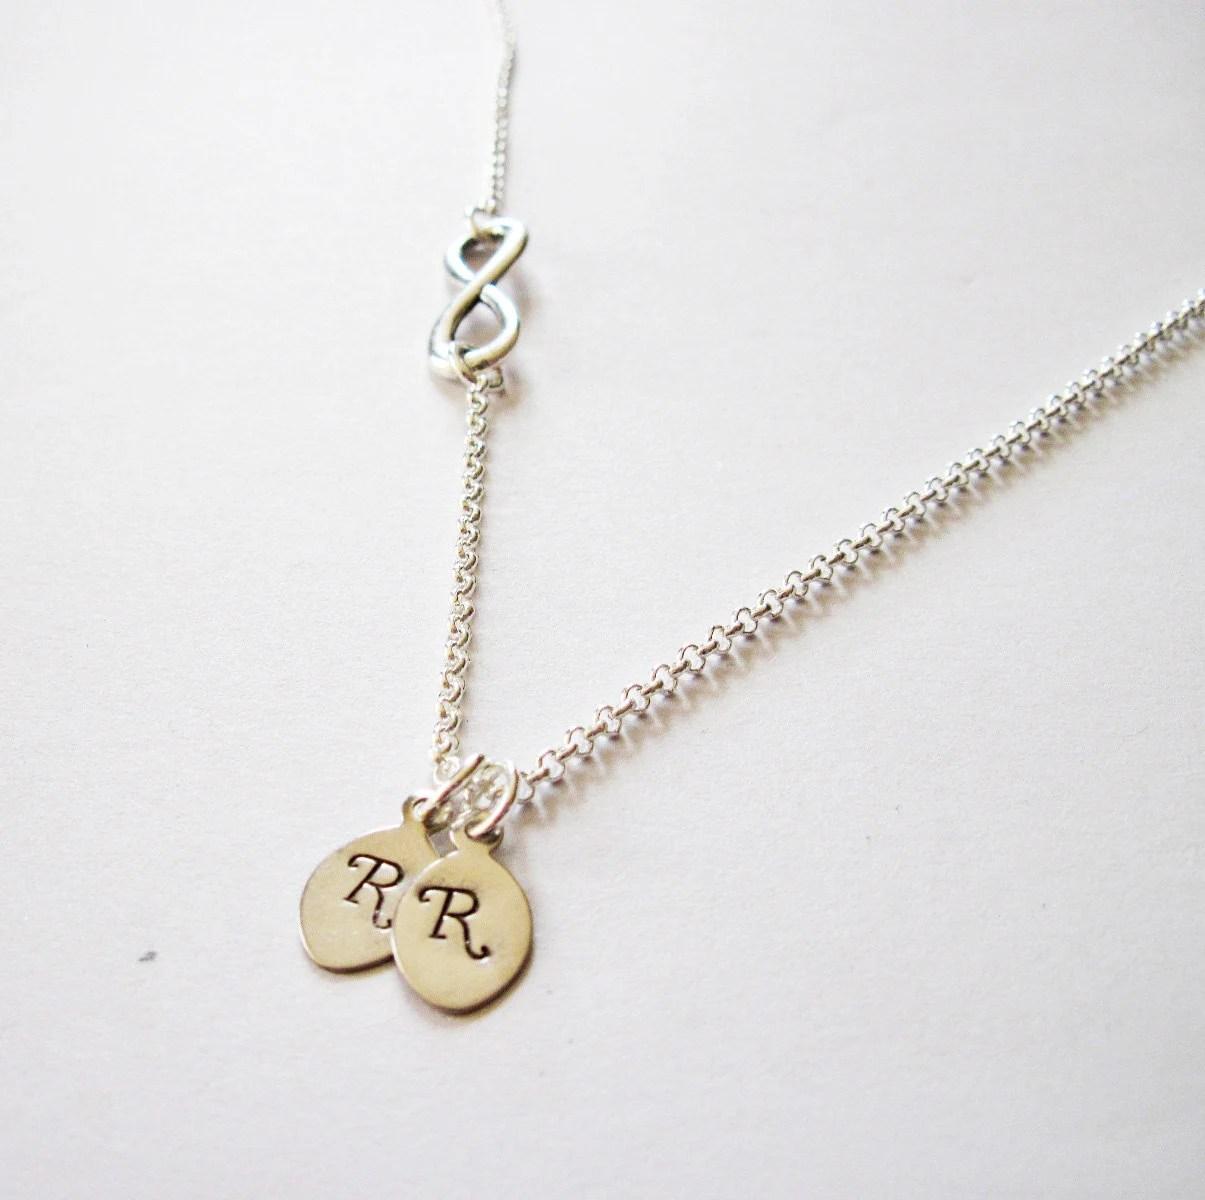 Infinity Necklace With Initial Charm Sideways Infinity